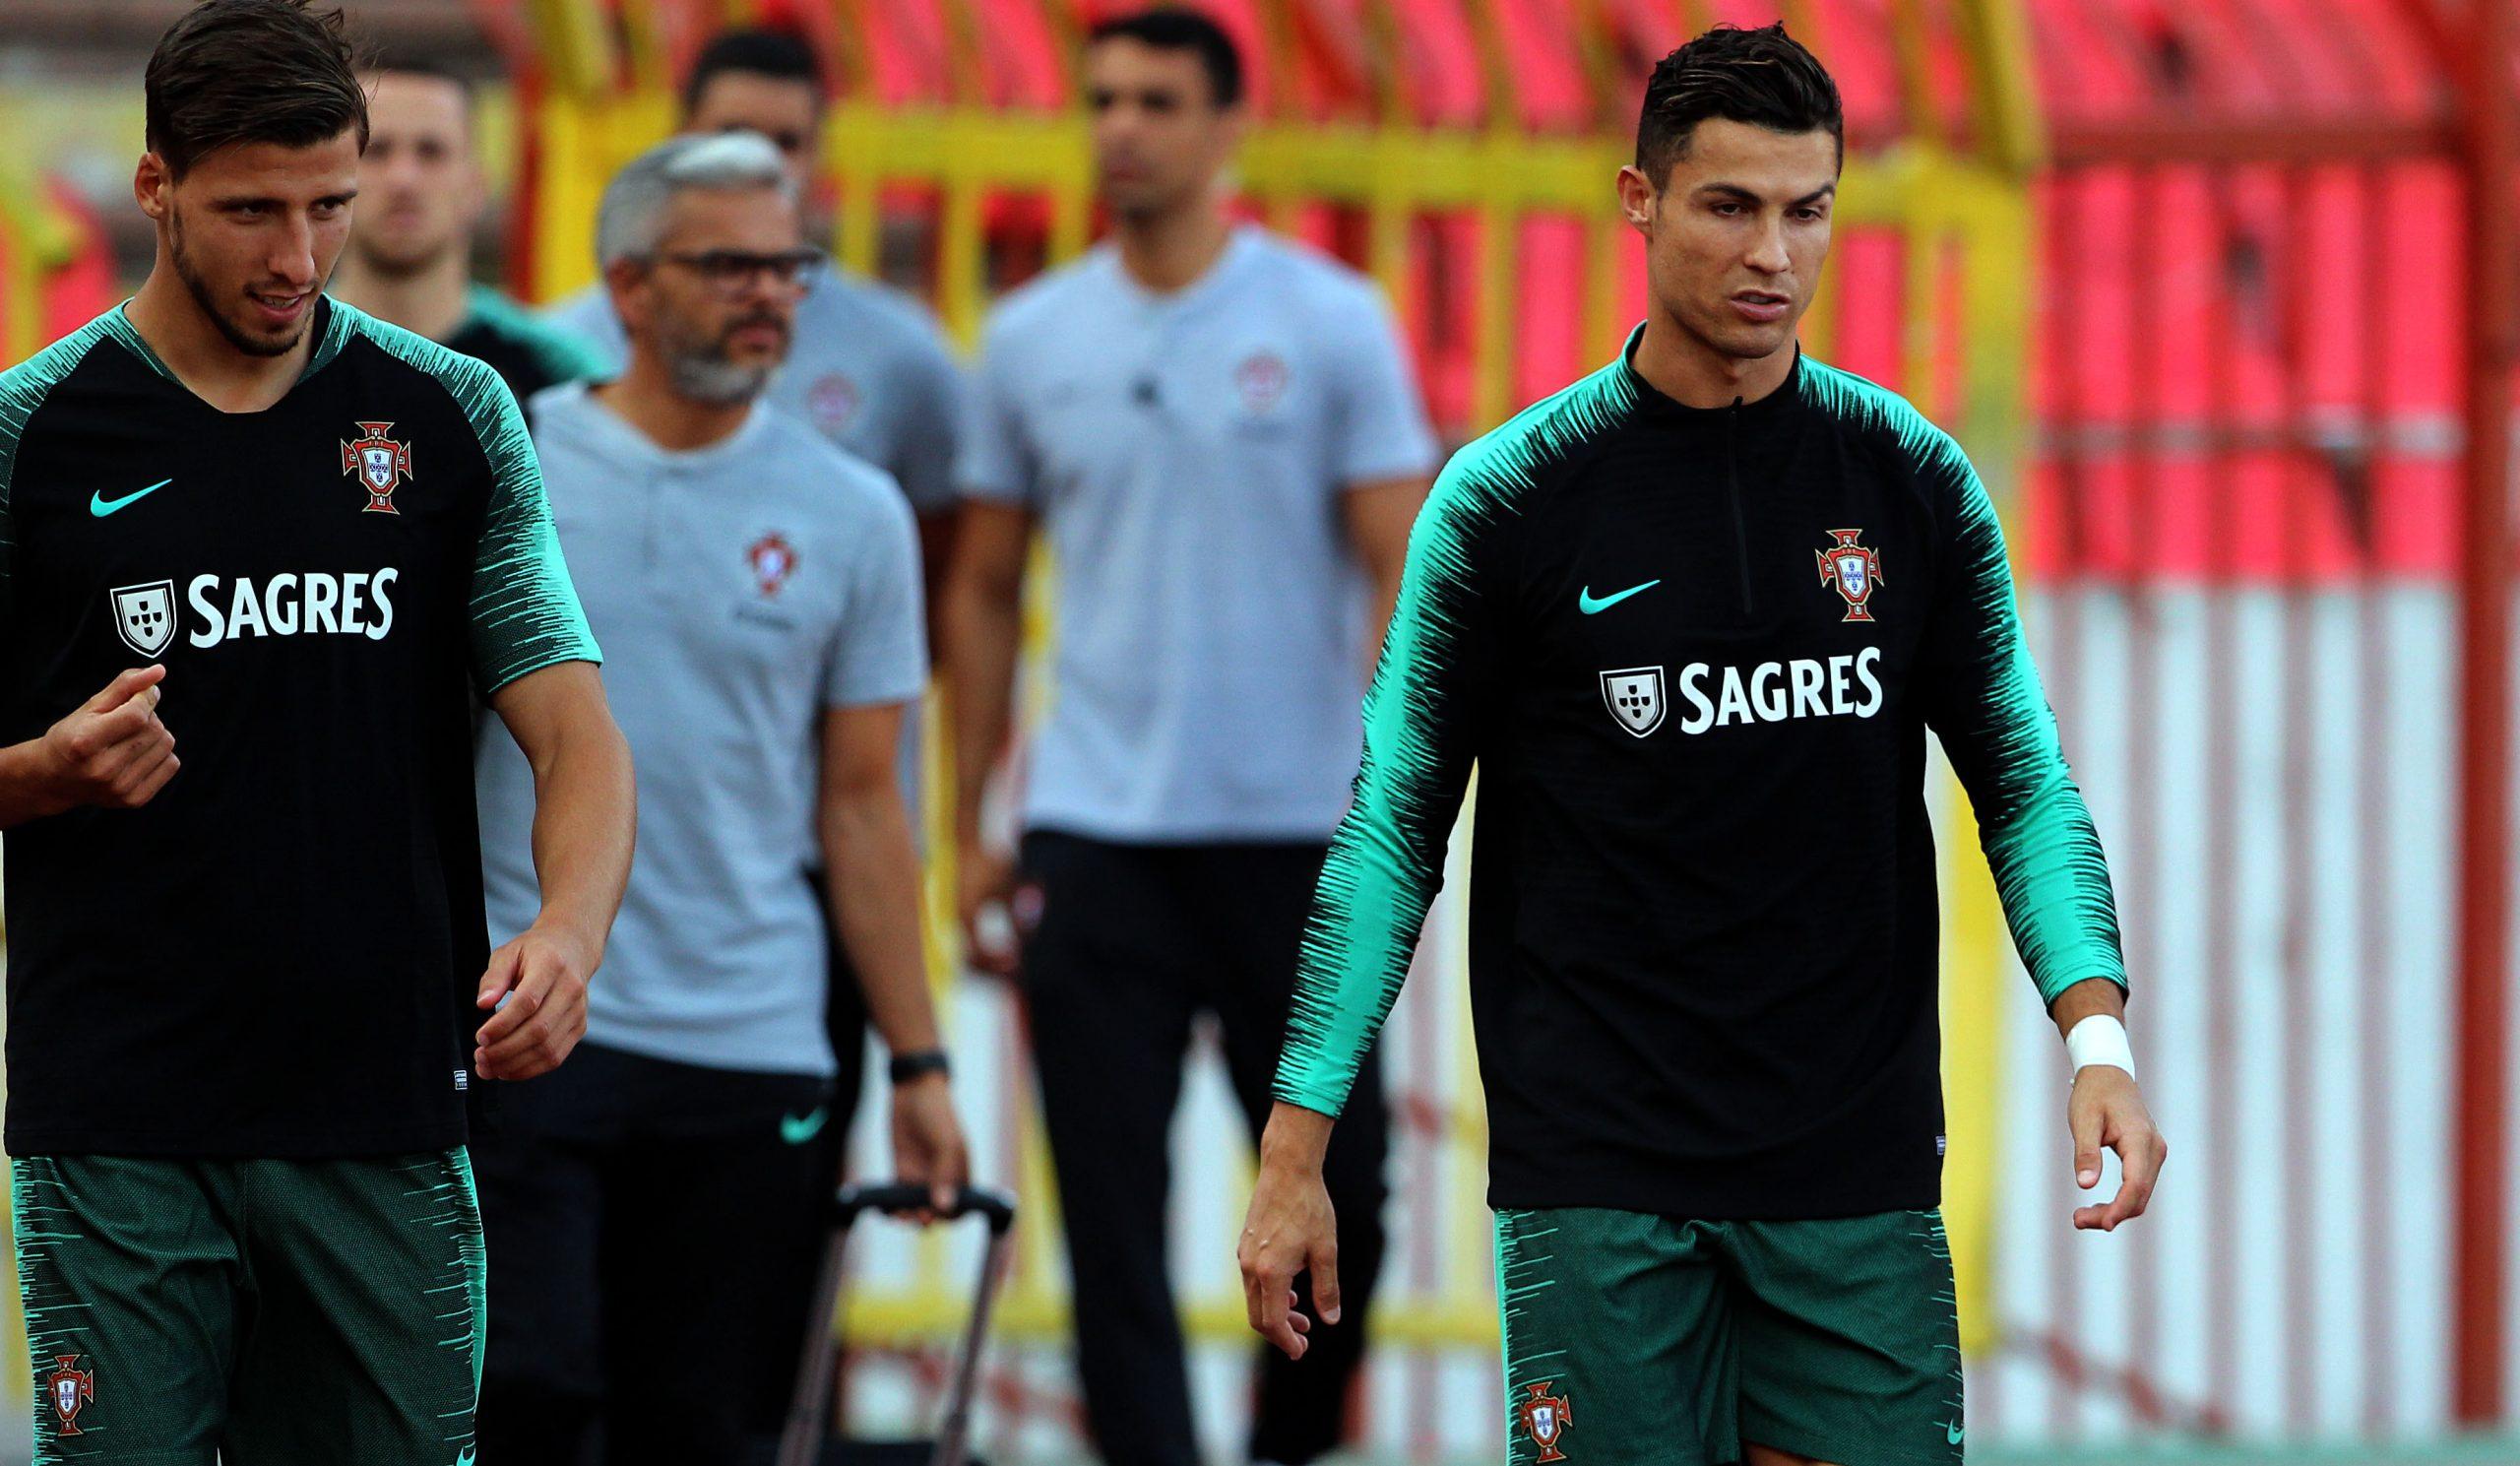 Ruben Dias et Cristiano Ronaldo